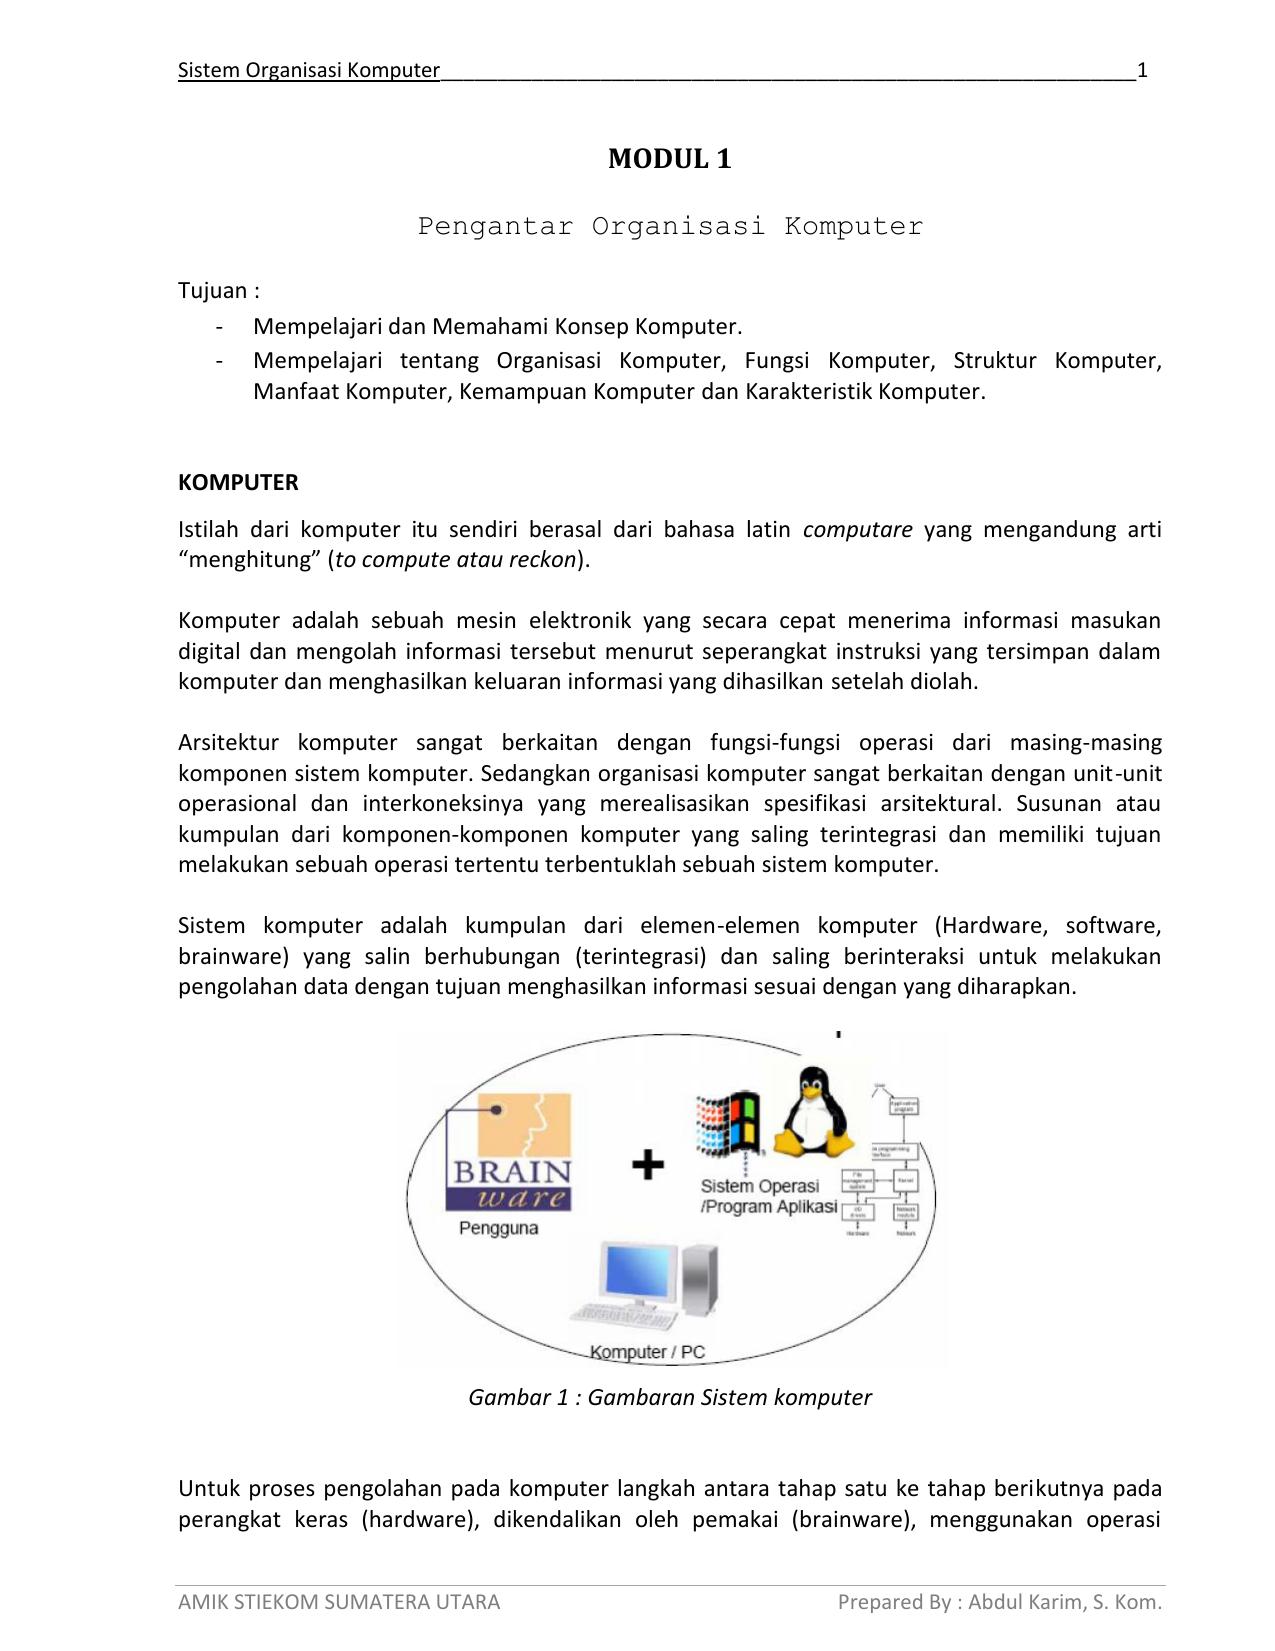 Modul 1 Pengantar Organisasi Komputer